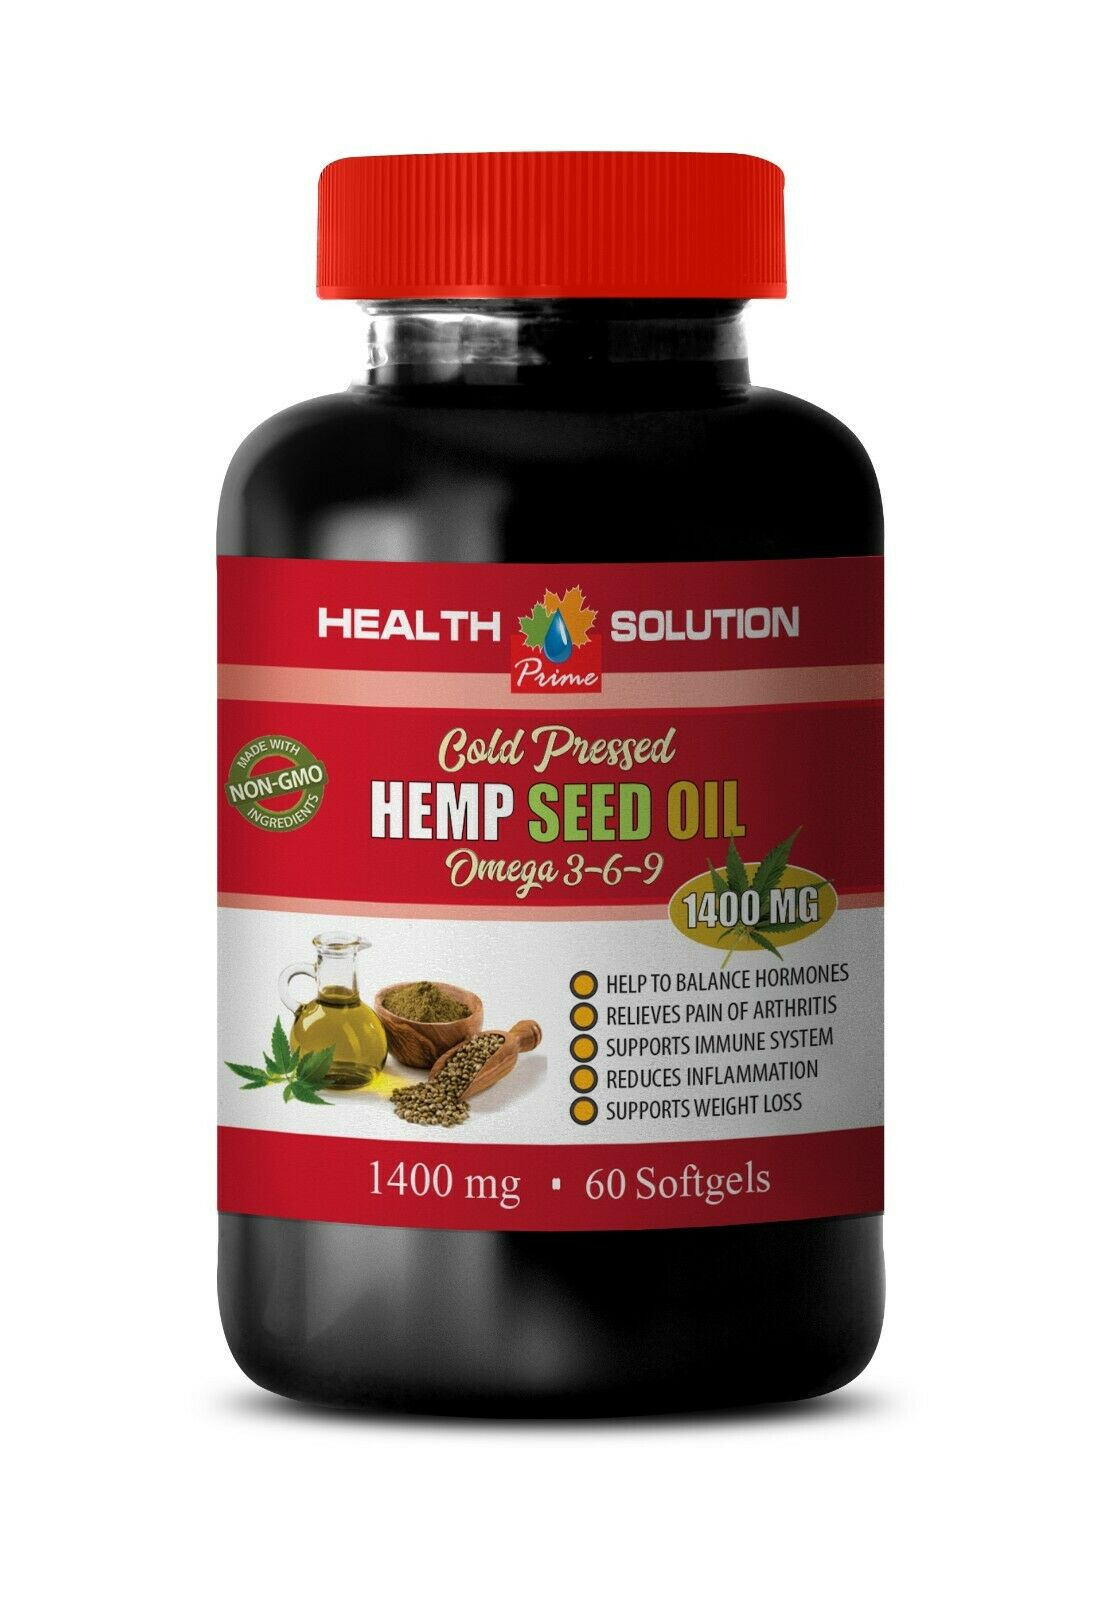 hemp oil relief - ORGANIC HEMP SEED OIL 1400MG 1B- pain relief supplement